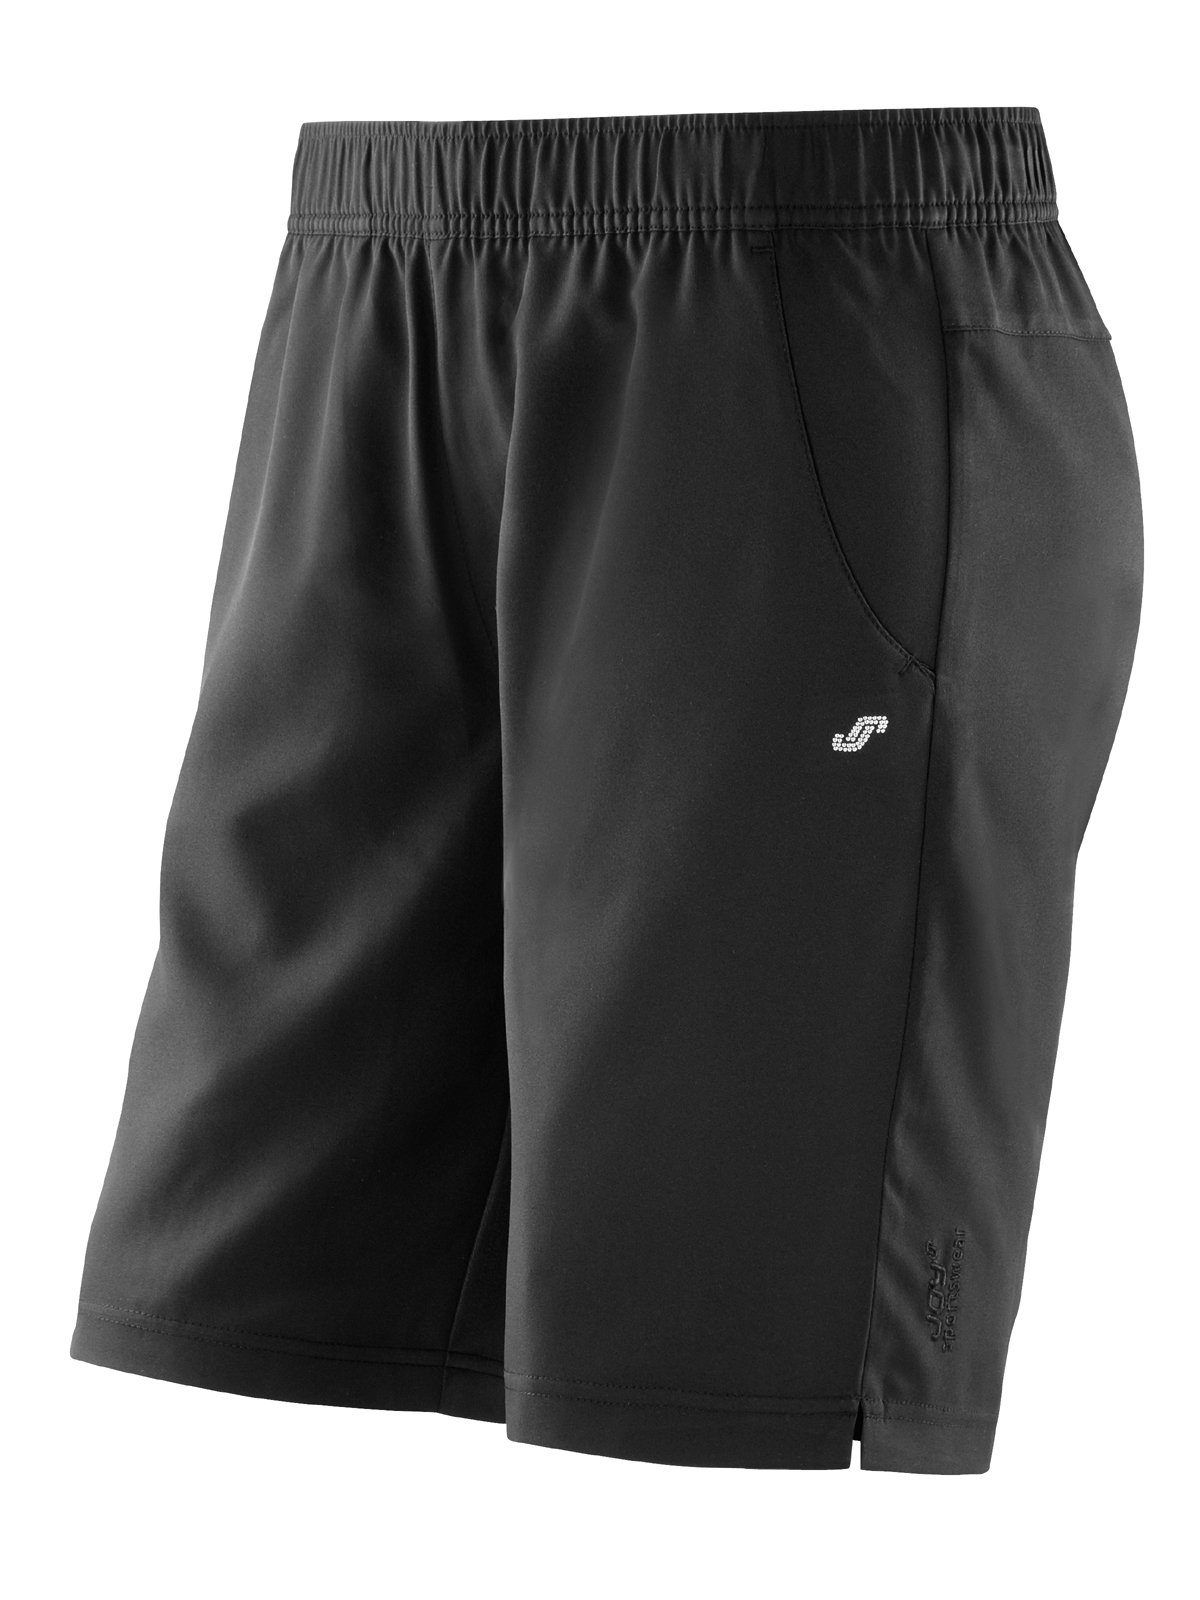 Joy Sportswear Shorts ROBERTA | Sportbekleidung > Sporthosen > Sportshorts | Joy Sportswear